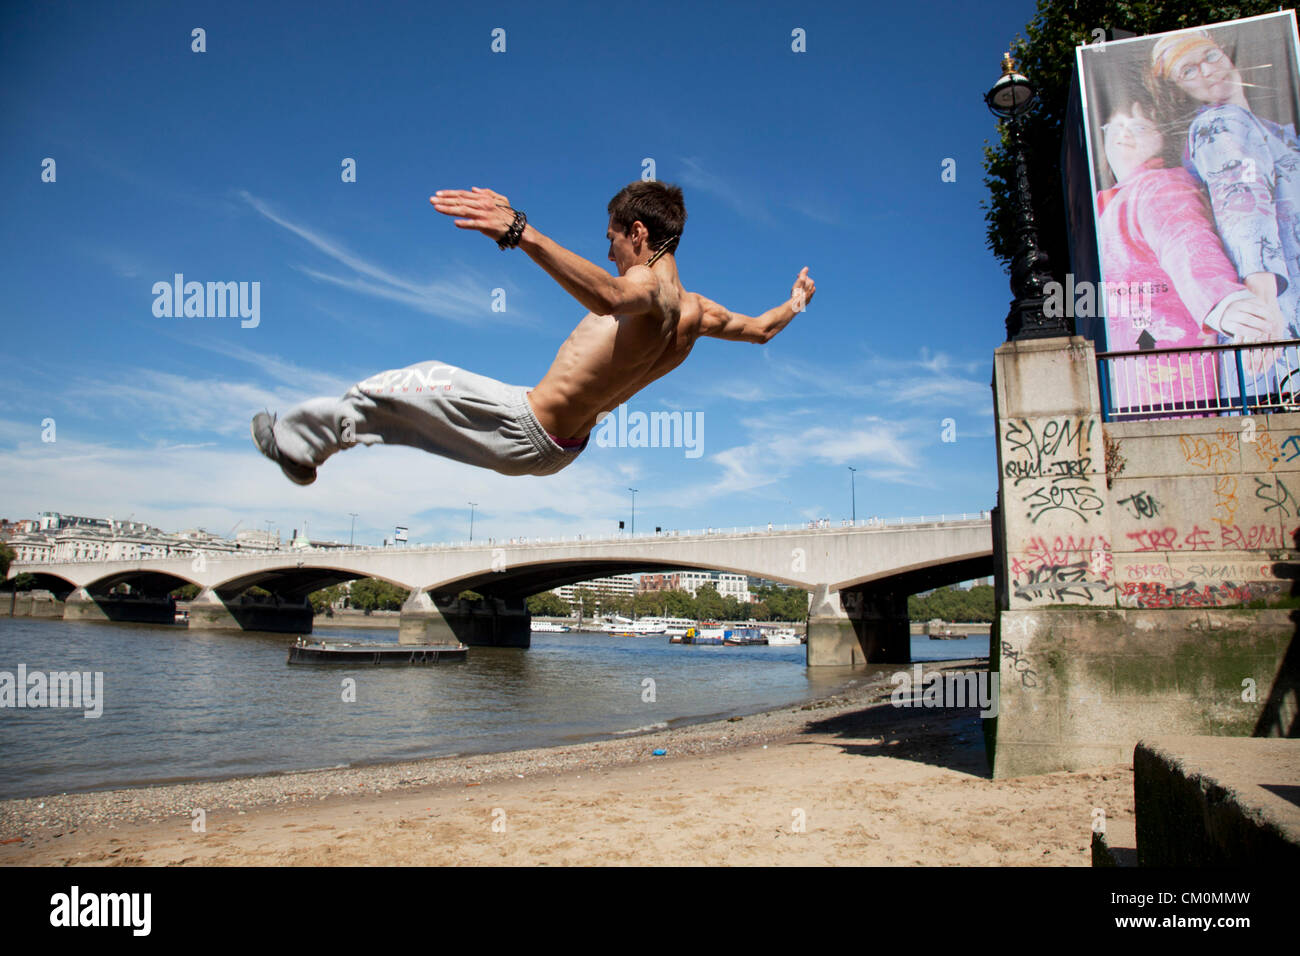 London, UK. 8th September, 2012. Parkour runner. The Mayor's Thames Festival is London's largest outdoor arts festival - Stock Image